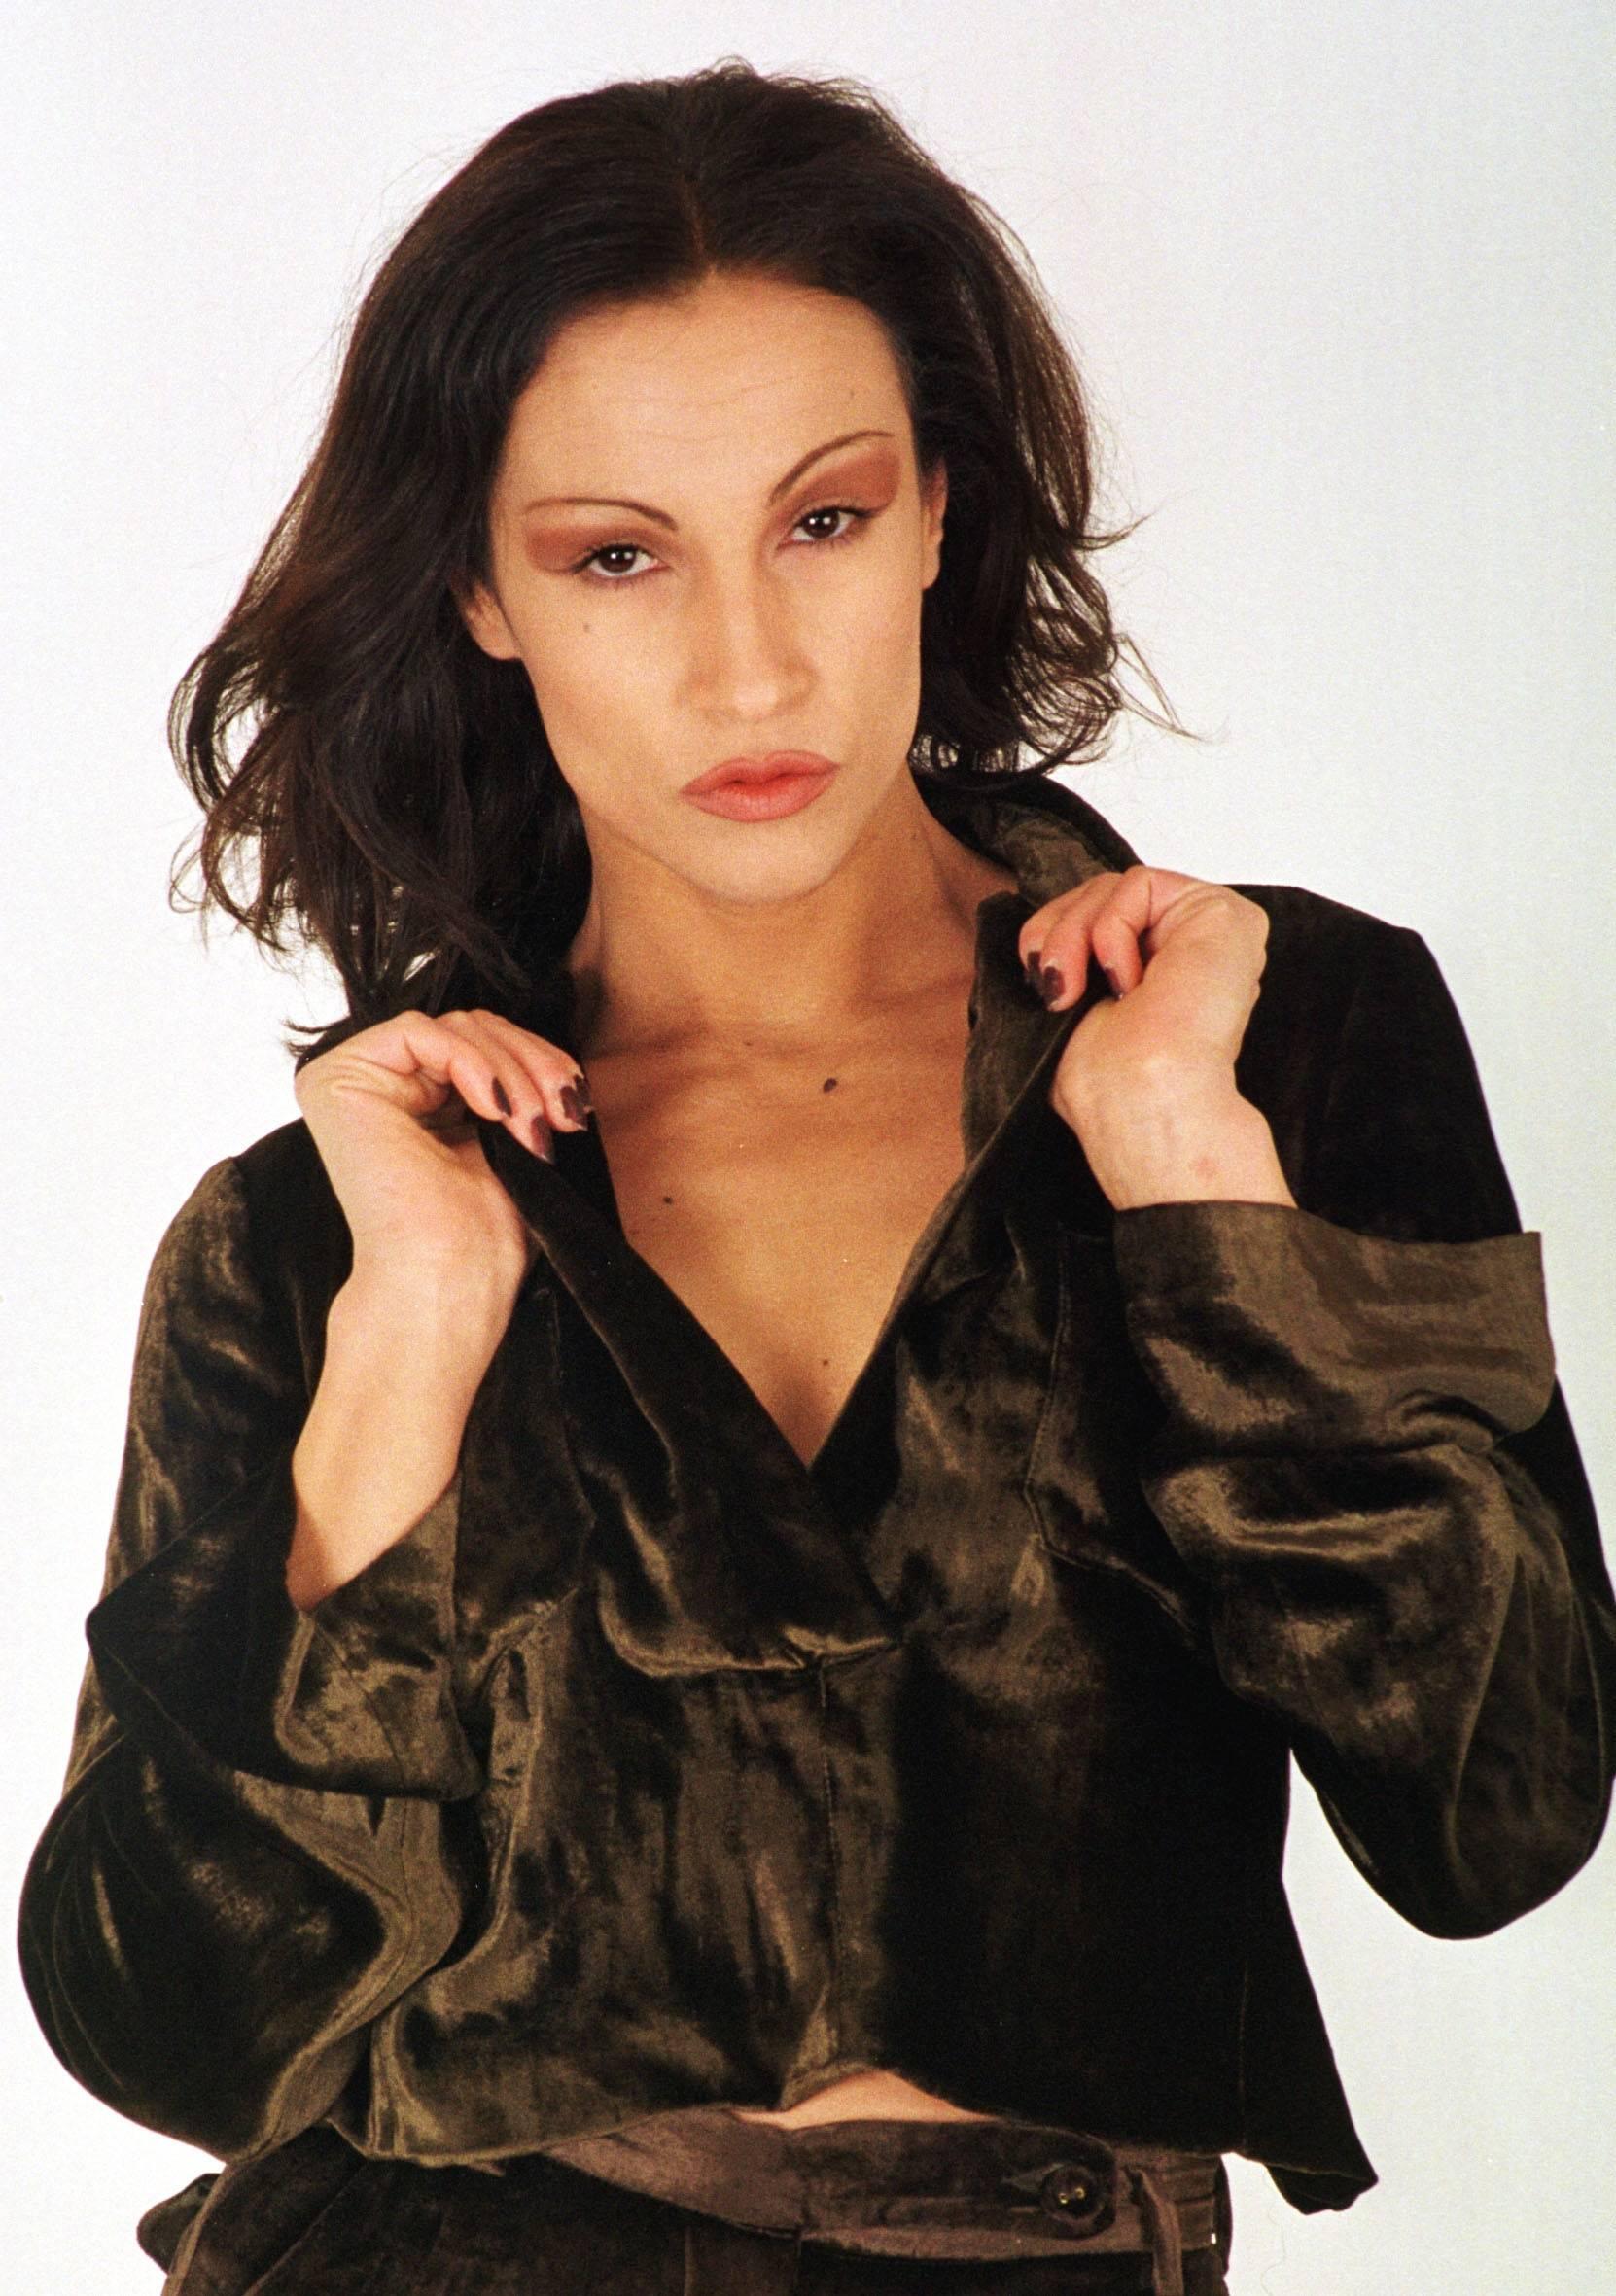 Ivana Banfic